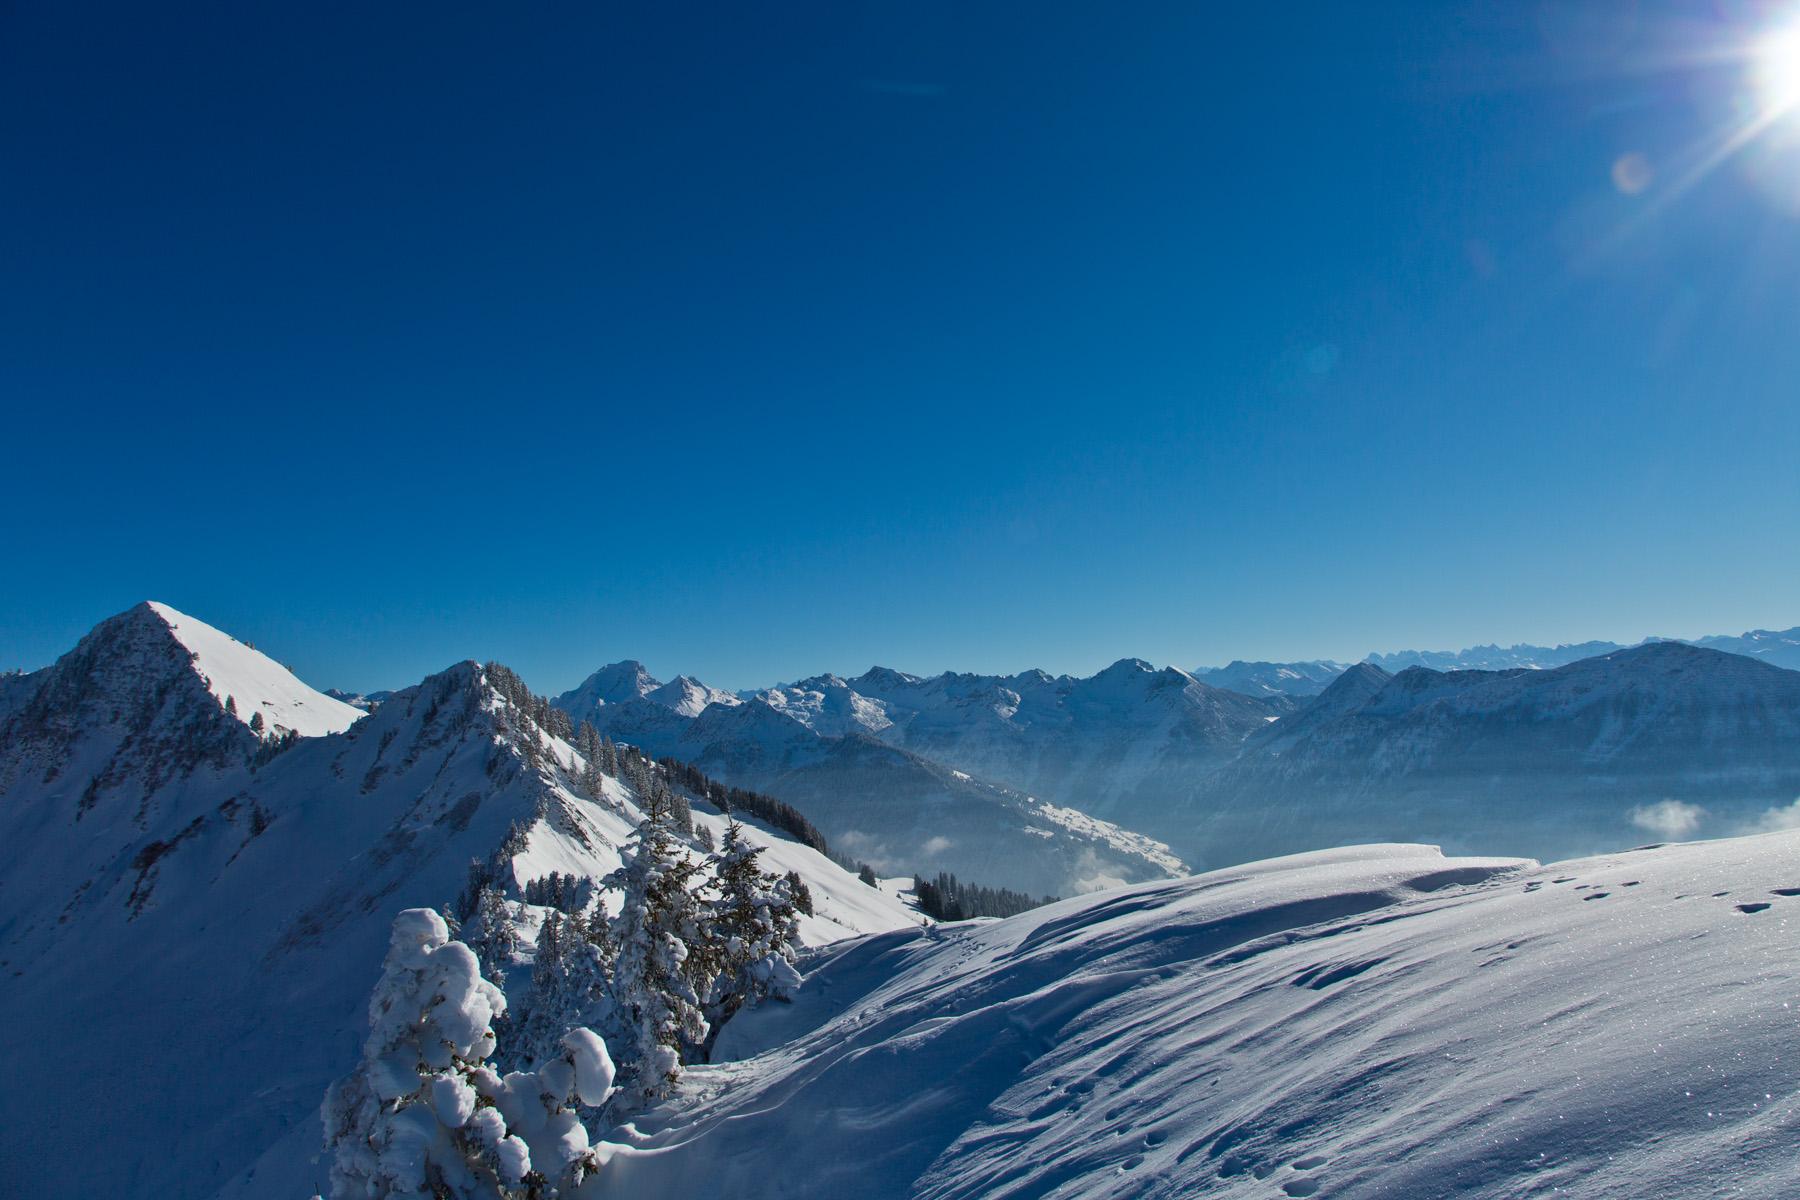 Mutabellspitze; dahinter Grosses Walsertal